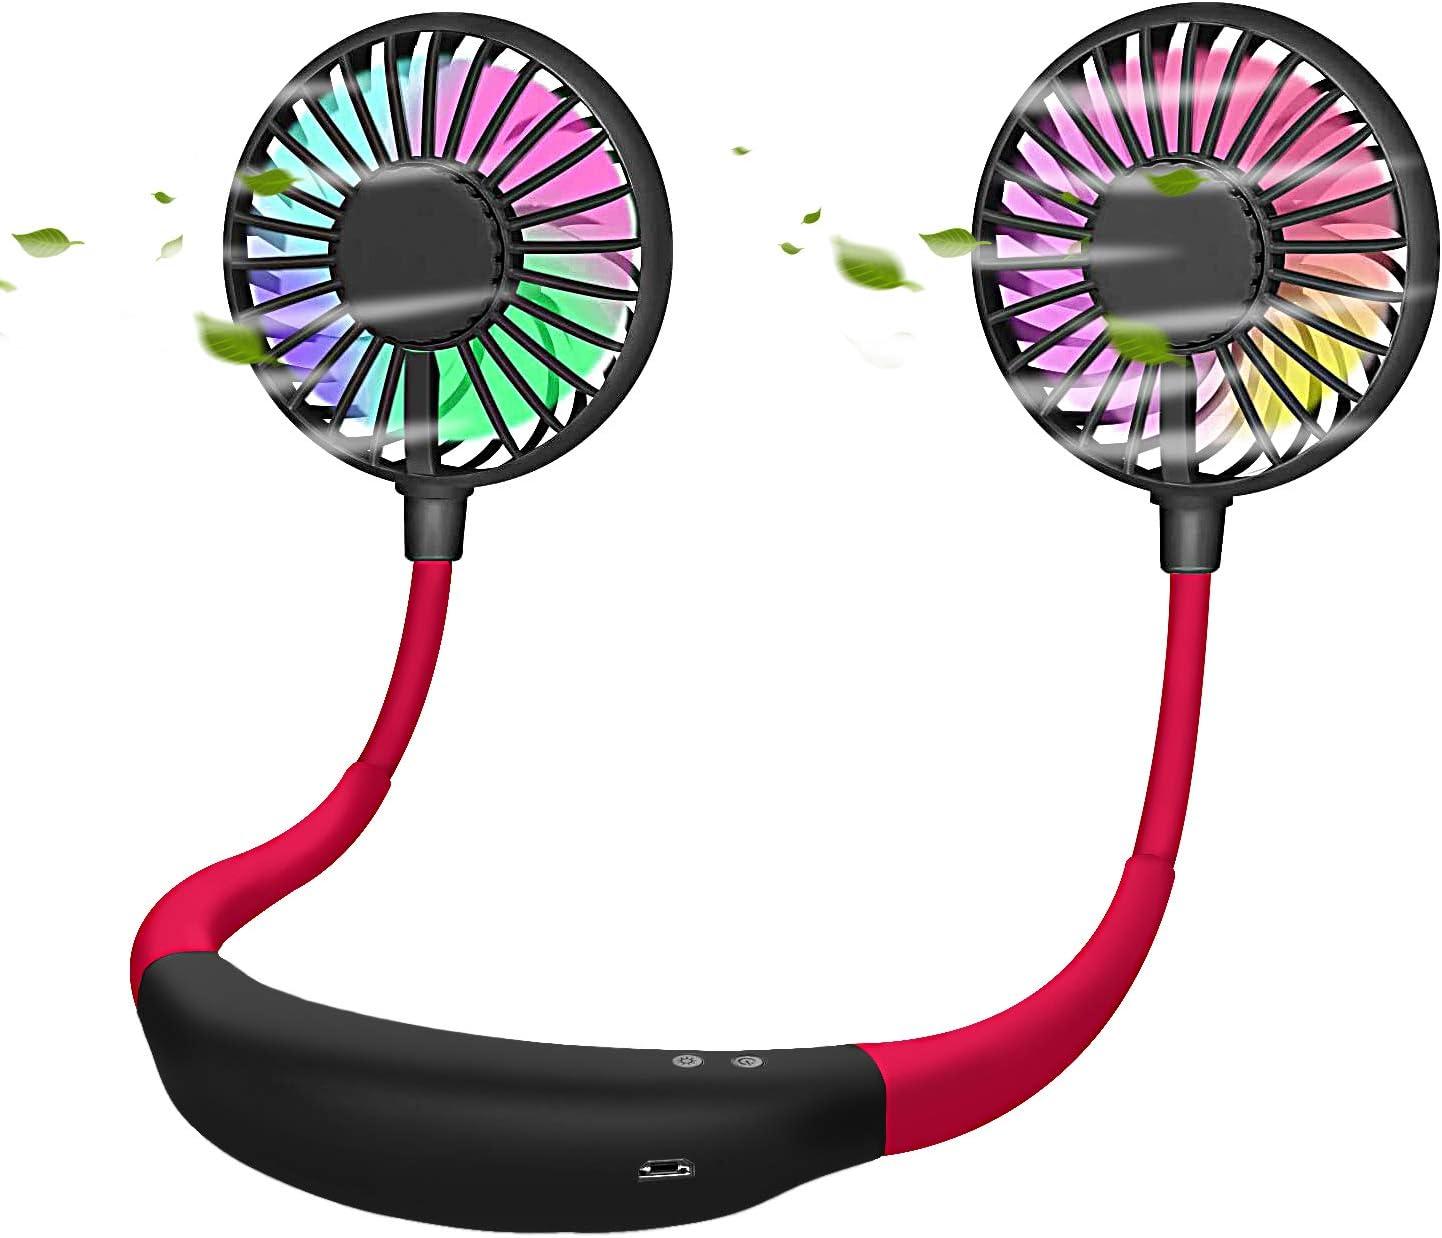 abitku Cooling Neckband Fan, Lazy Portable Neckband Fan, Hands Free Personal Portable USB Mini Fan Rechargeable Headphone Design Wearable 360° Cooling Adjustment, 3 Speeds & 2 Modes LED Light, Black